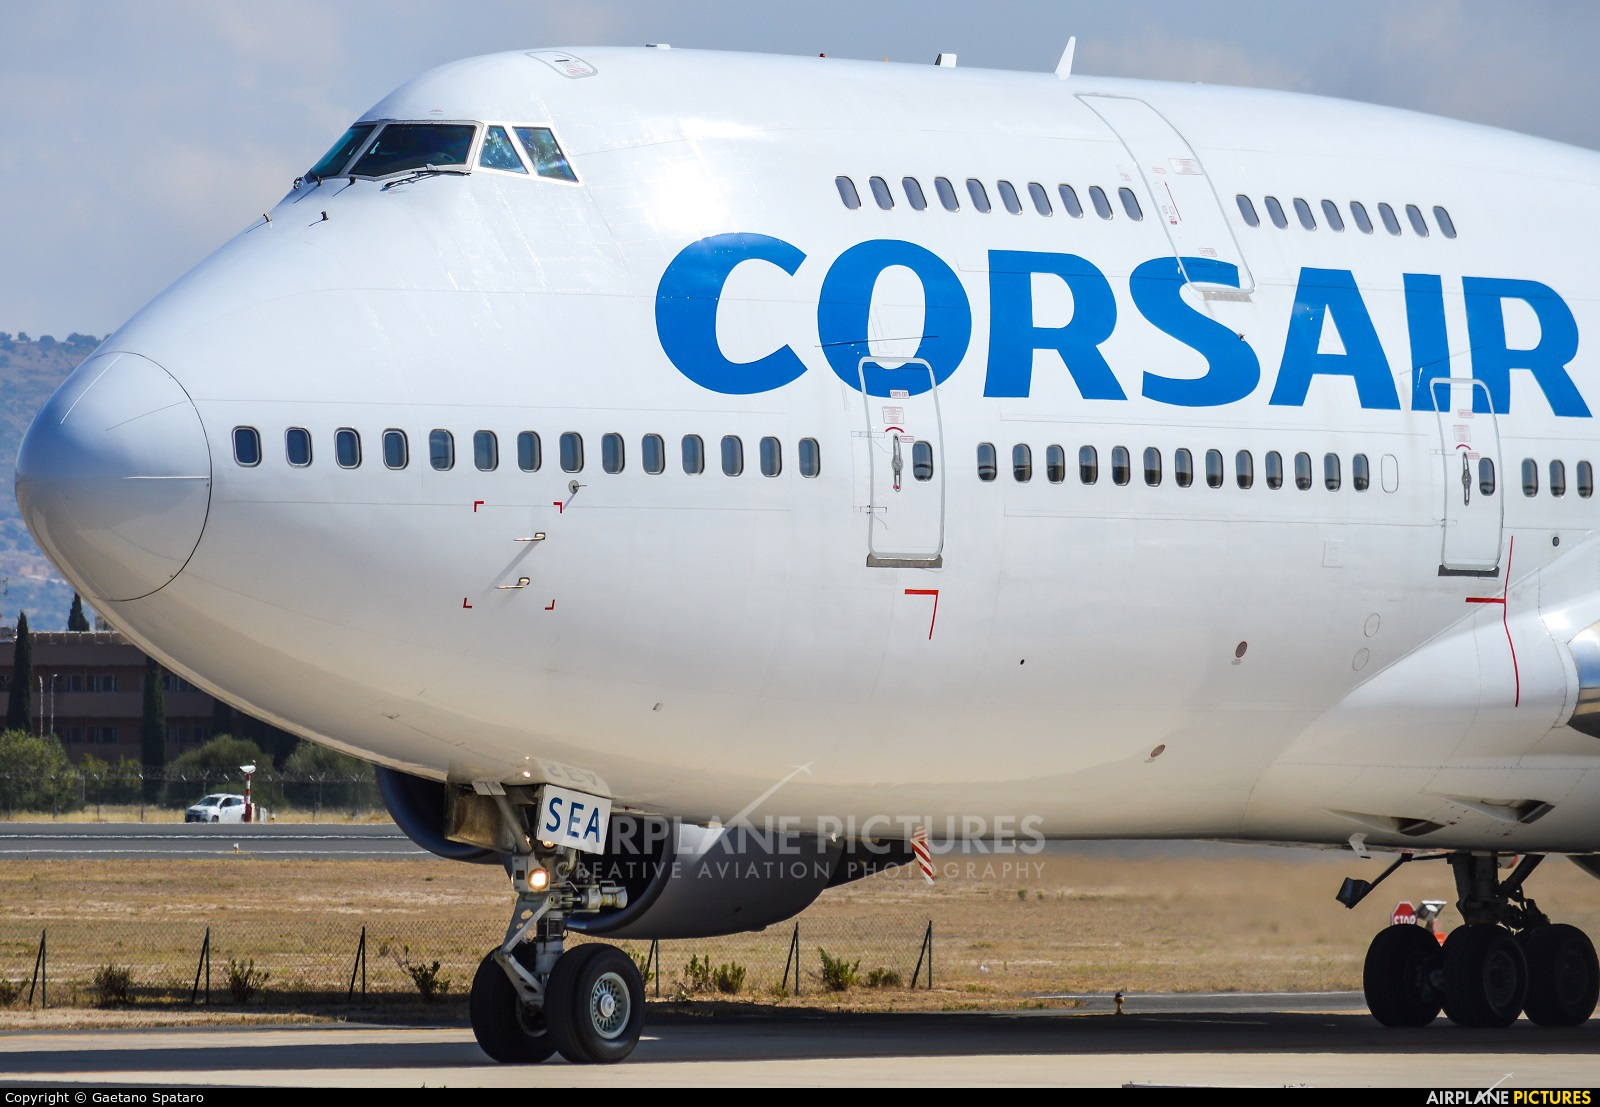 Corsair / Corsair Intl F-HSEA aircraft at Comiso - Sicily